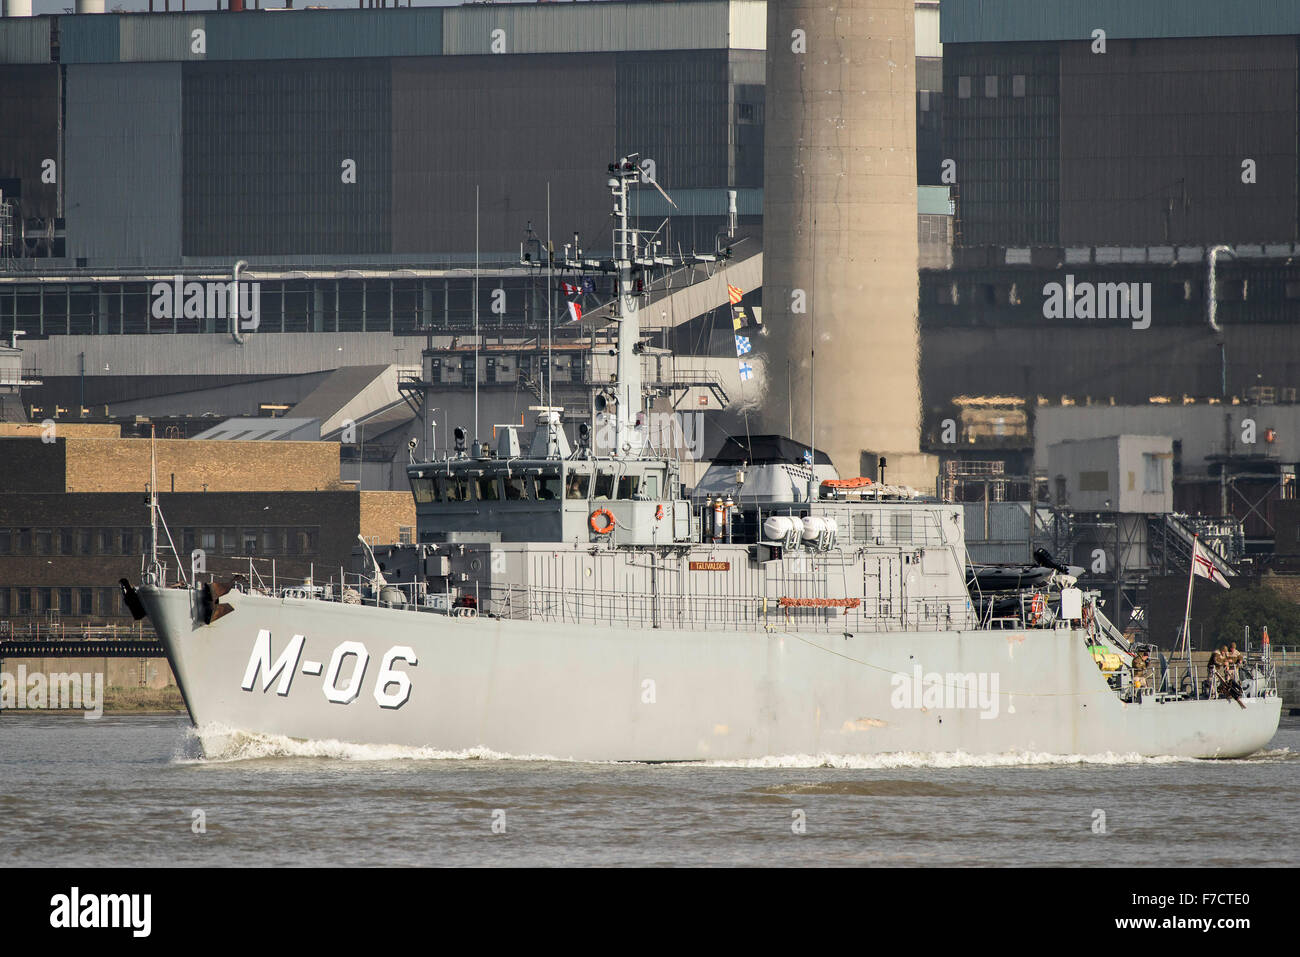 The NATO minehunter LVNS Talivaldis (M-06) steams upriver on the River Thames. - Stock Image